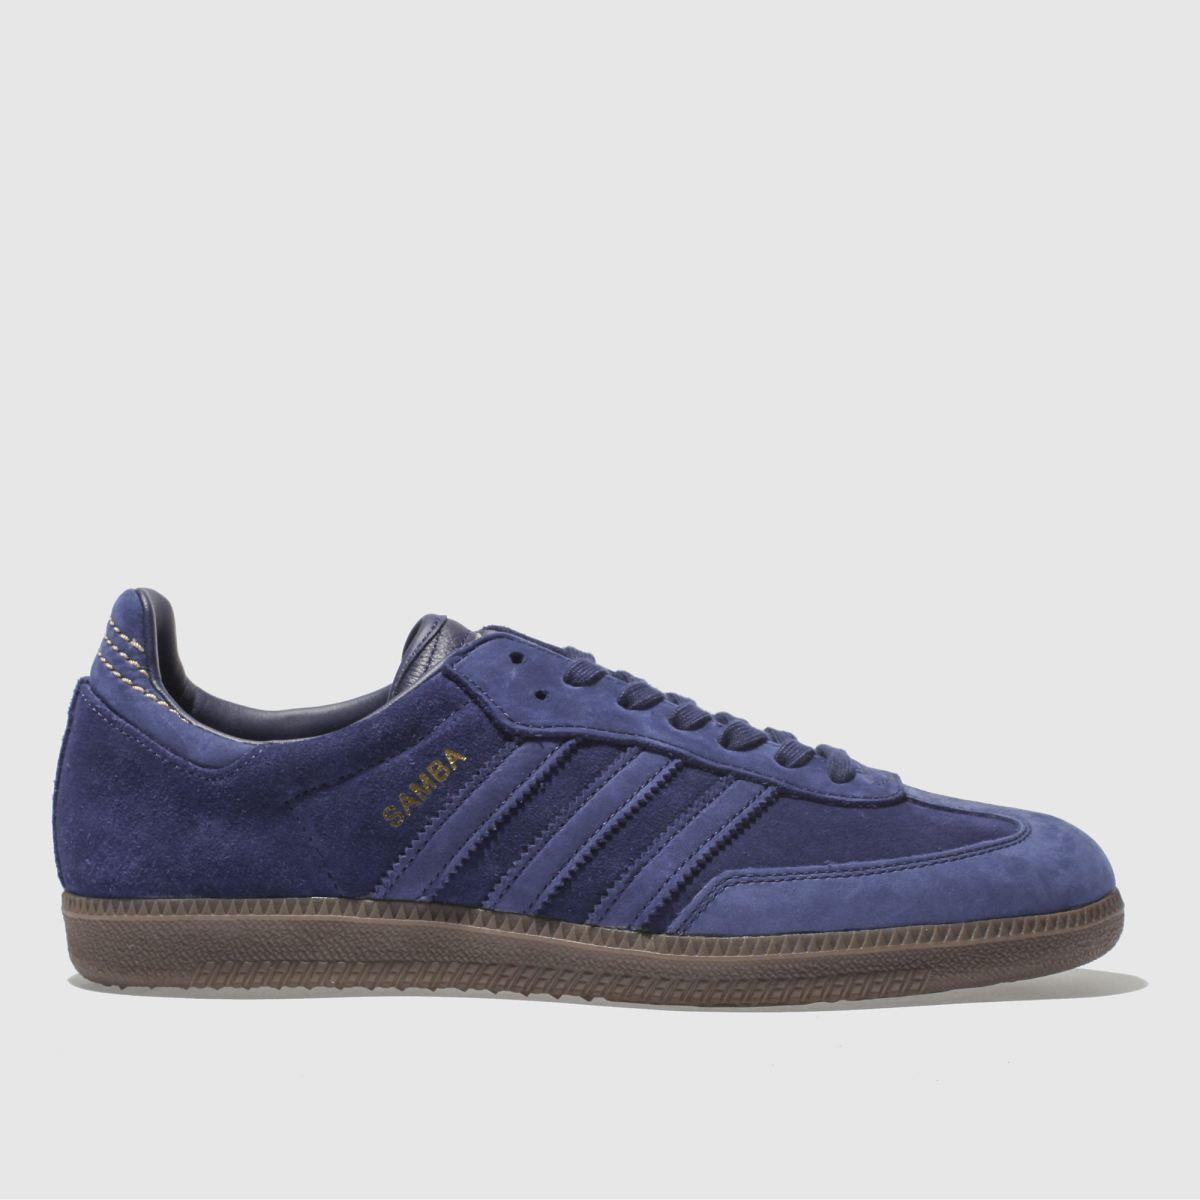 Adidas Blue Samba Fb Trainers